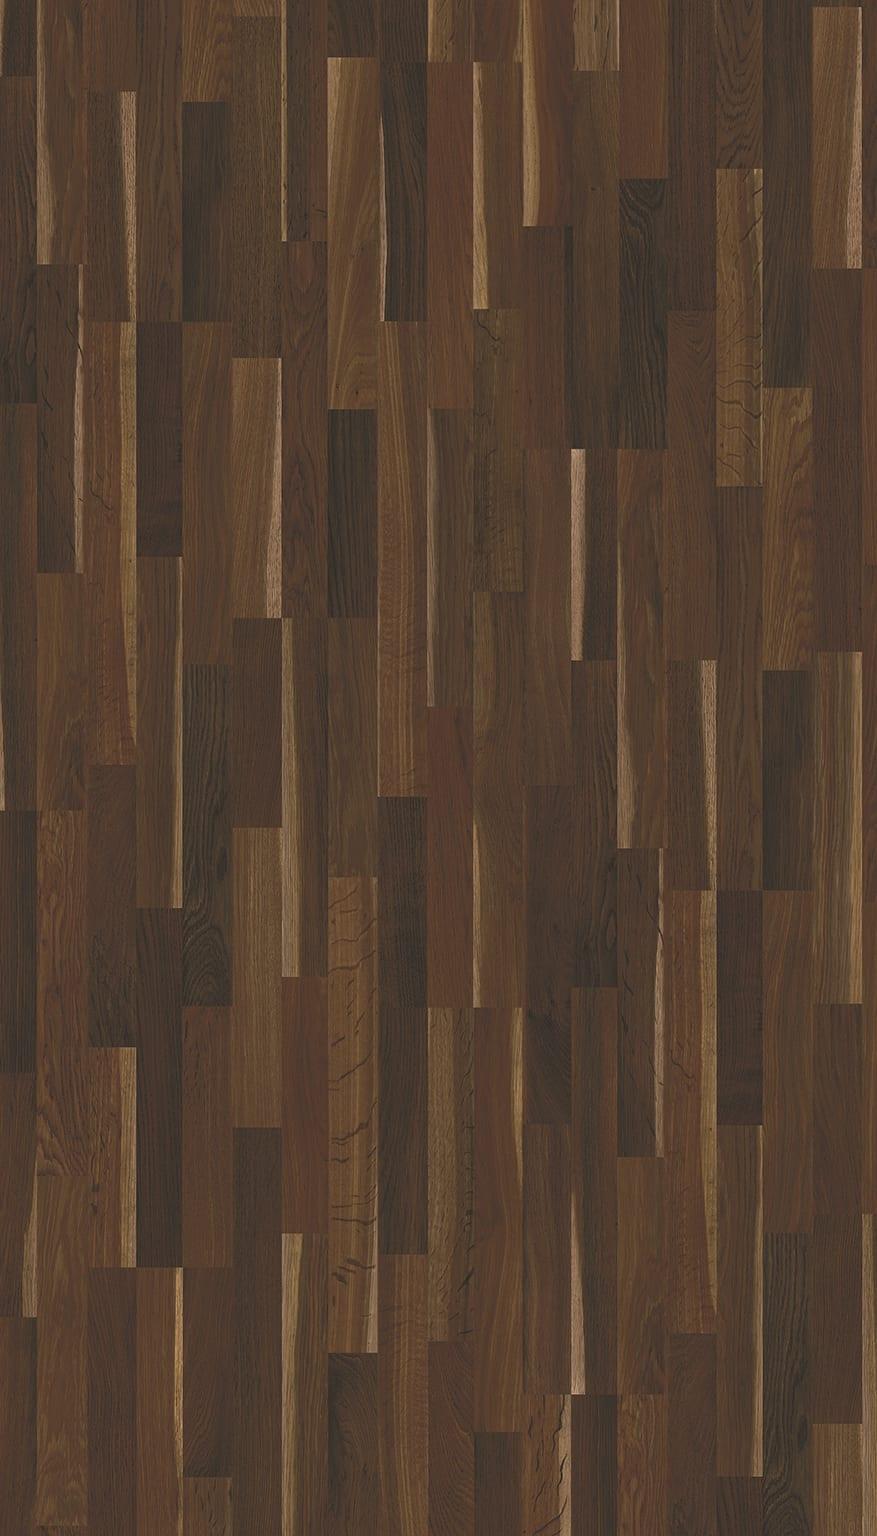 r uchereiche 3 stab parador laminat classic 1050 parador classic 1050 r uchereiche 3 stab. Black Bedroom Furniture Sets. Home Design Ideas